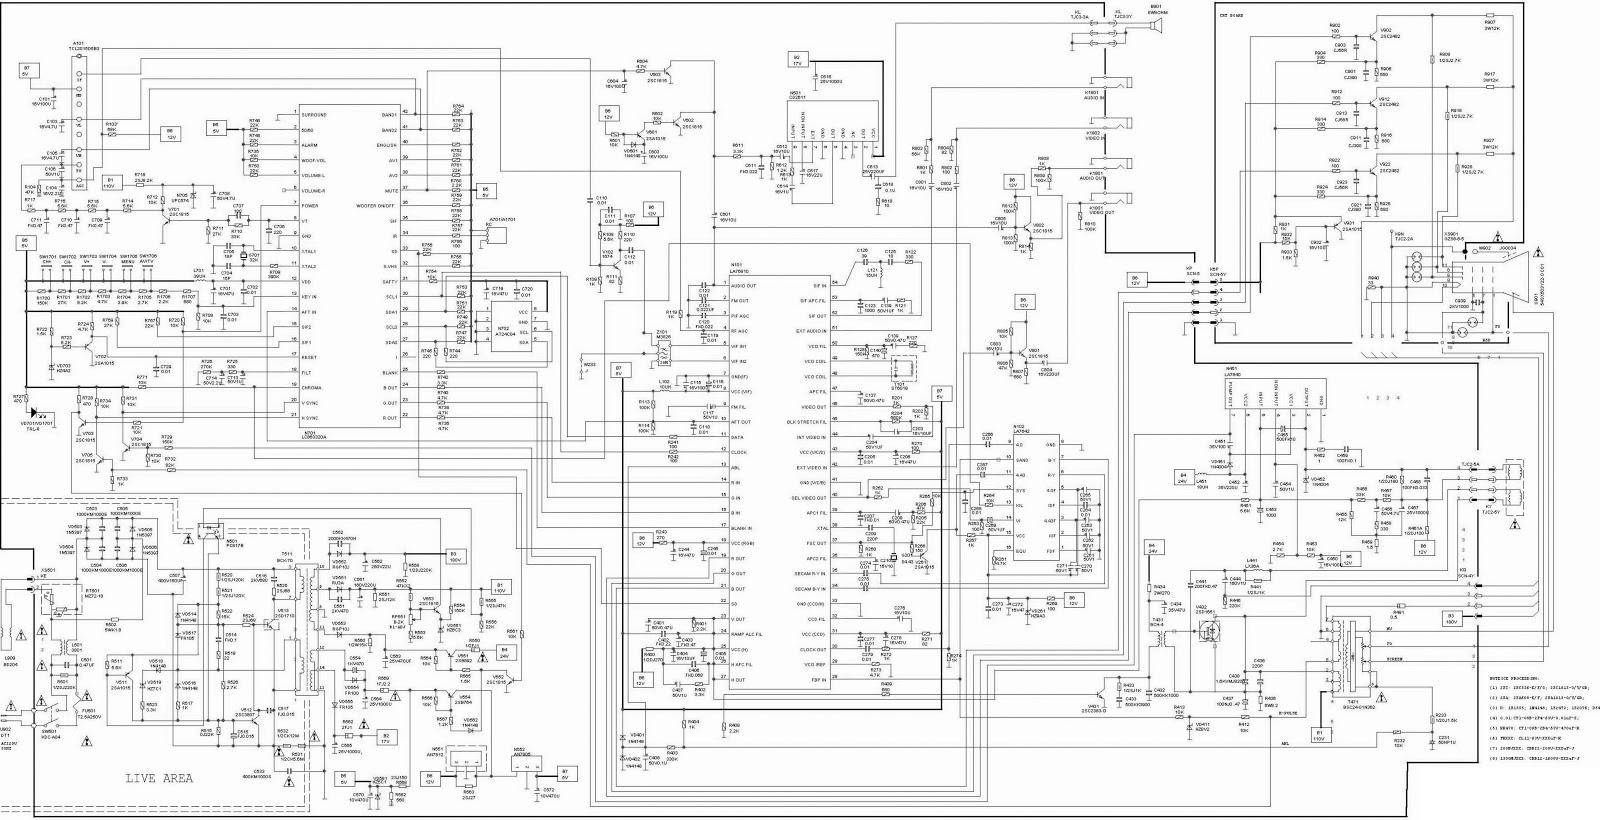 1992 honda accord radio wiring diagram rj45 phone jack dodge d350 auto